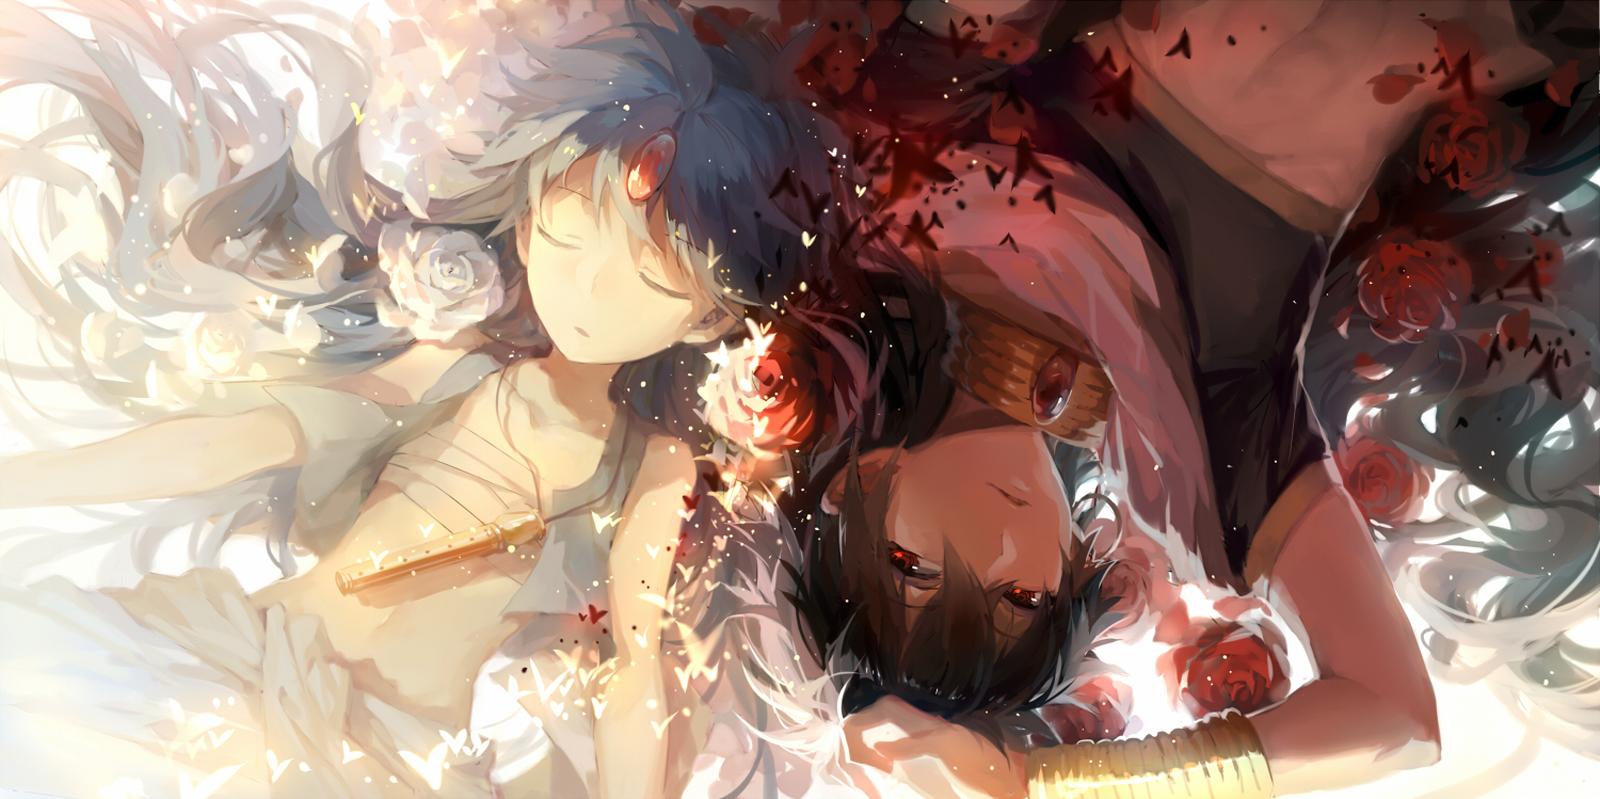 Alibba Judal Magi The Labyrinth Of Magic Anime Flowers Red Eye Konochan Hd Wallpaper Desktop Pc